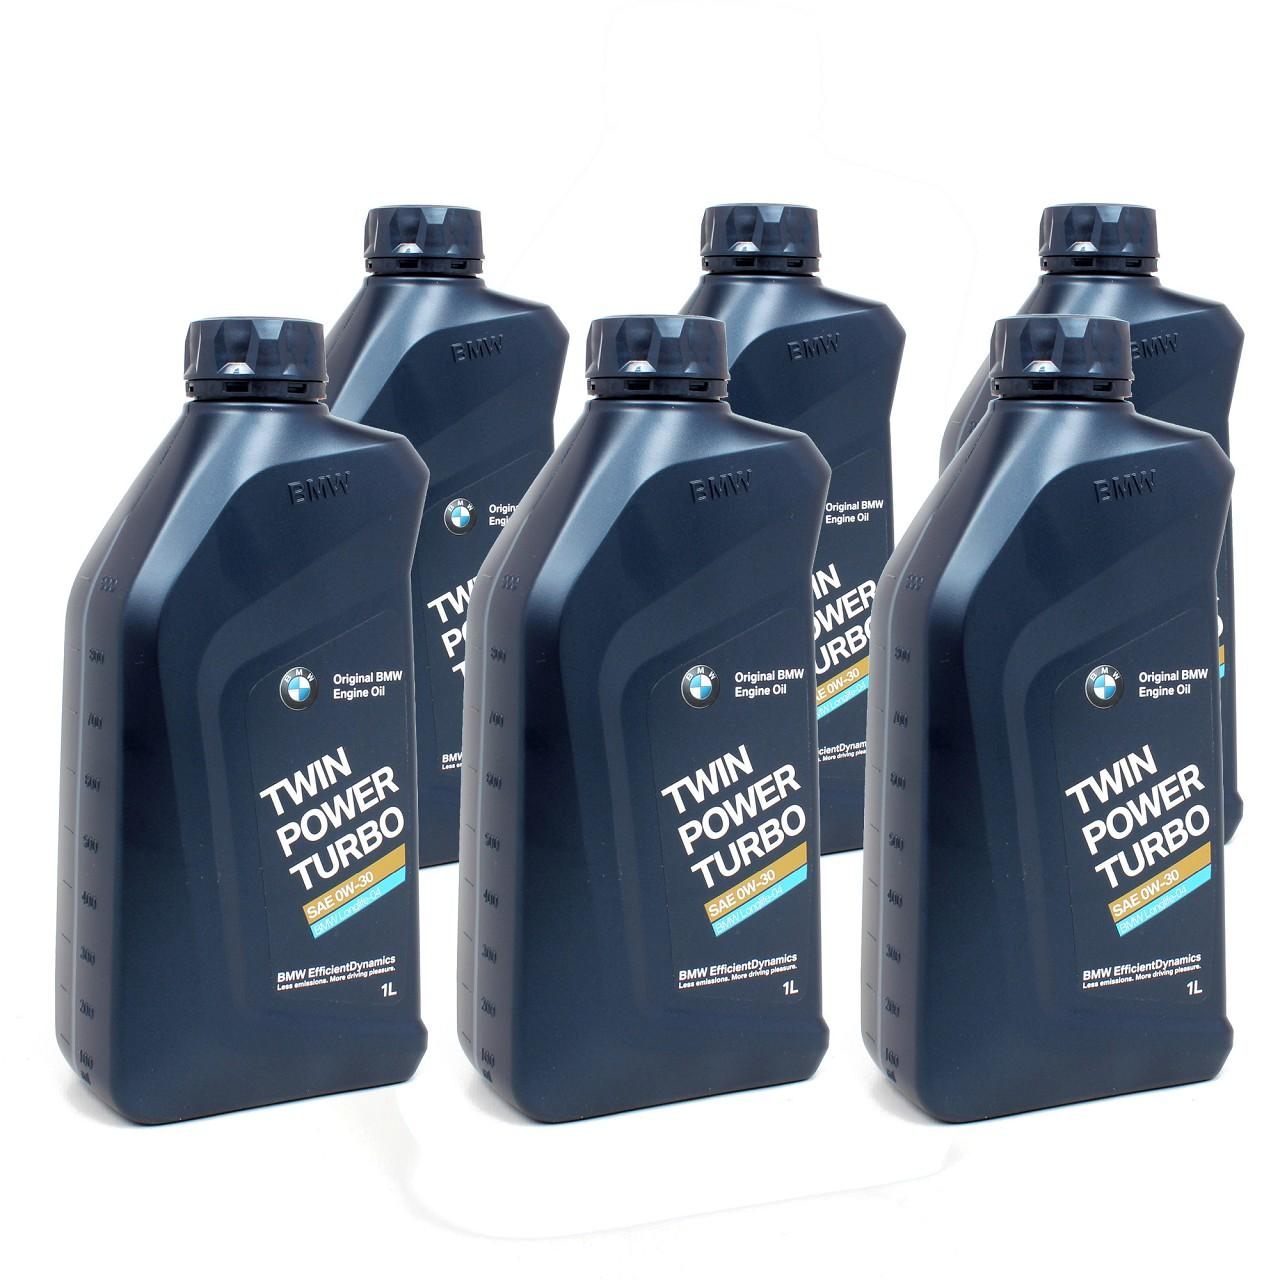 6 Liter ORIGINAL BMW Motoröl Öl 0W-30 Twin Power Turbo LongLife-04 83212465854